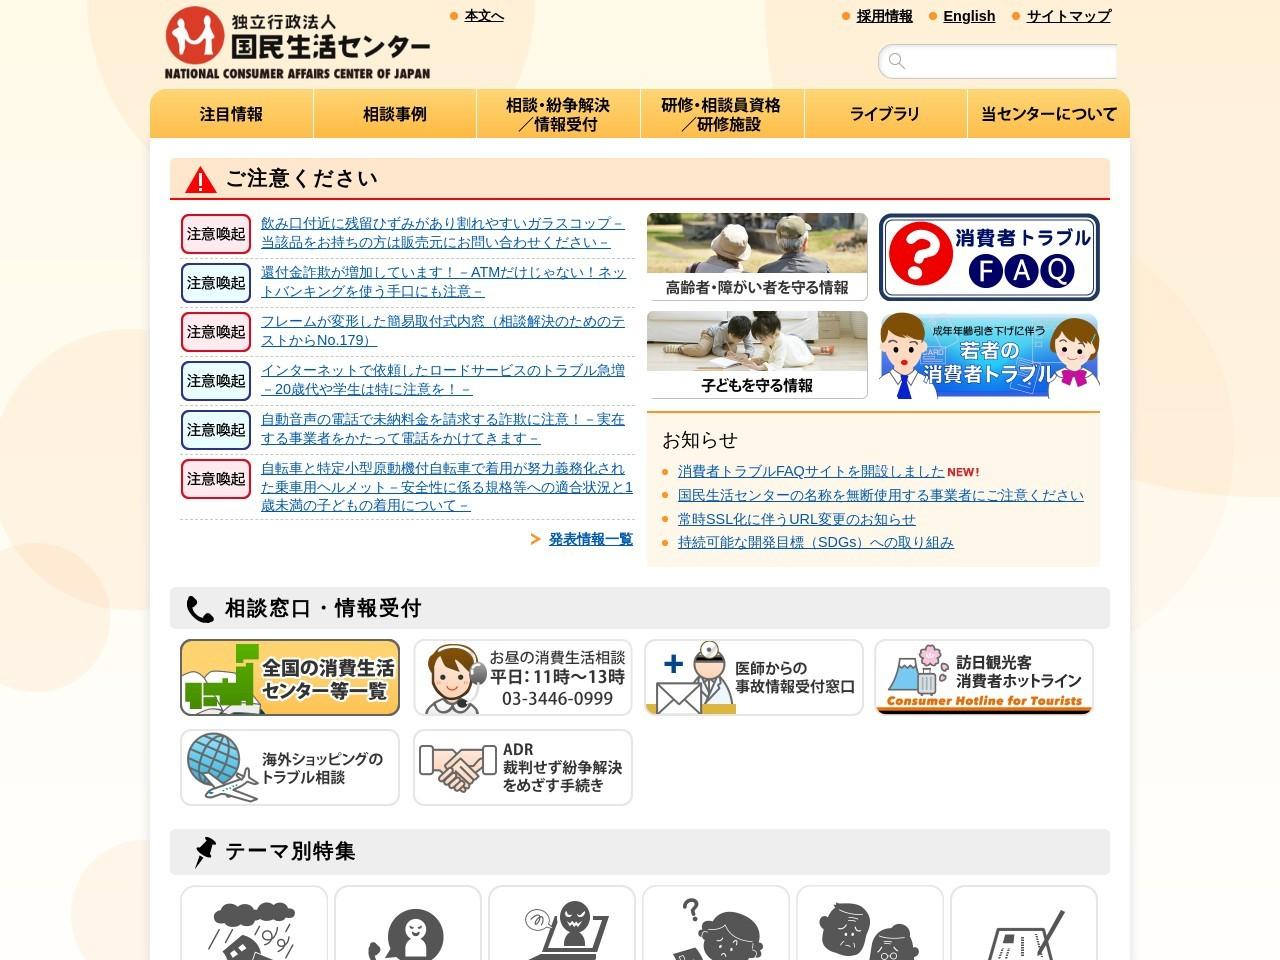 http://www.kokusen.go.jp/t_box/data/t_box-faq_qa2010_01.html